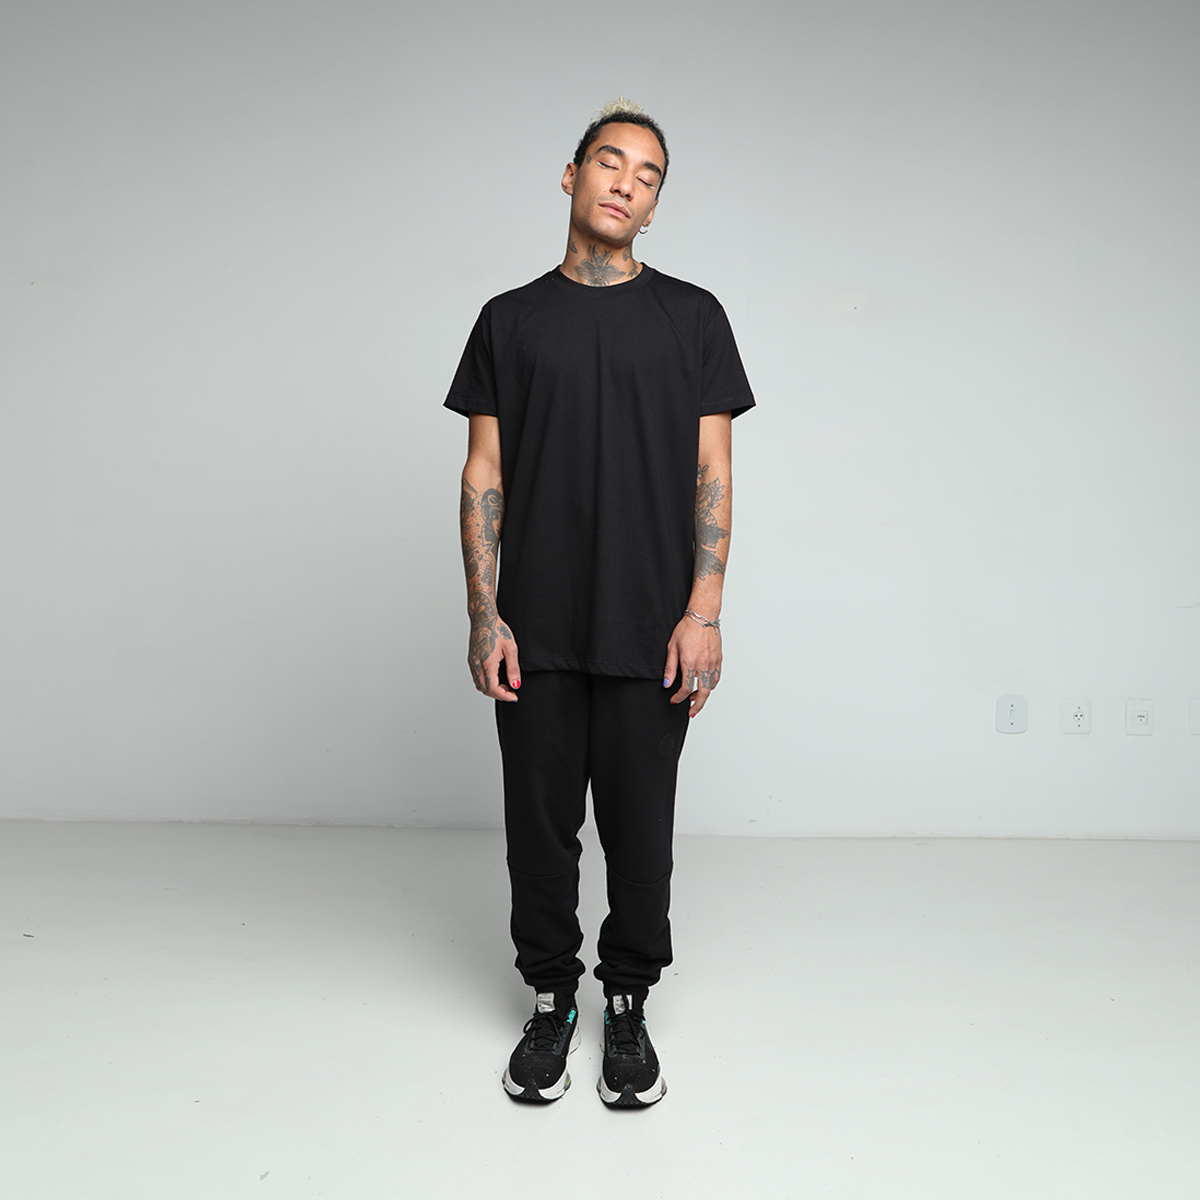 Camiseta Sk8 - Preto